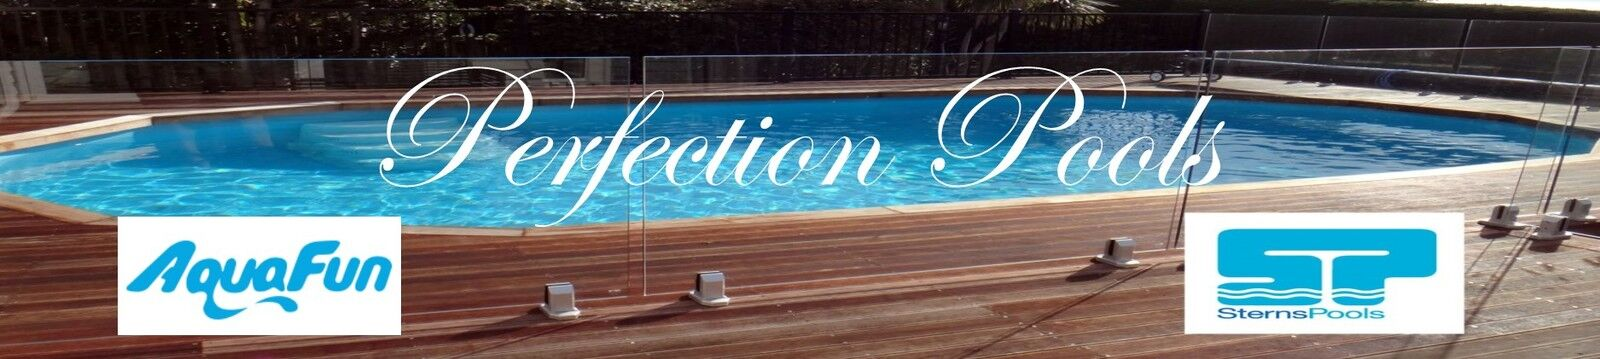 Perfection Pools Australia